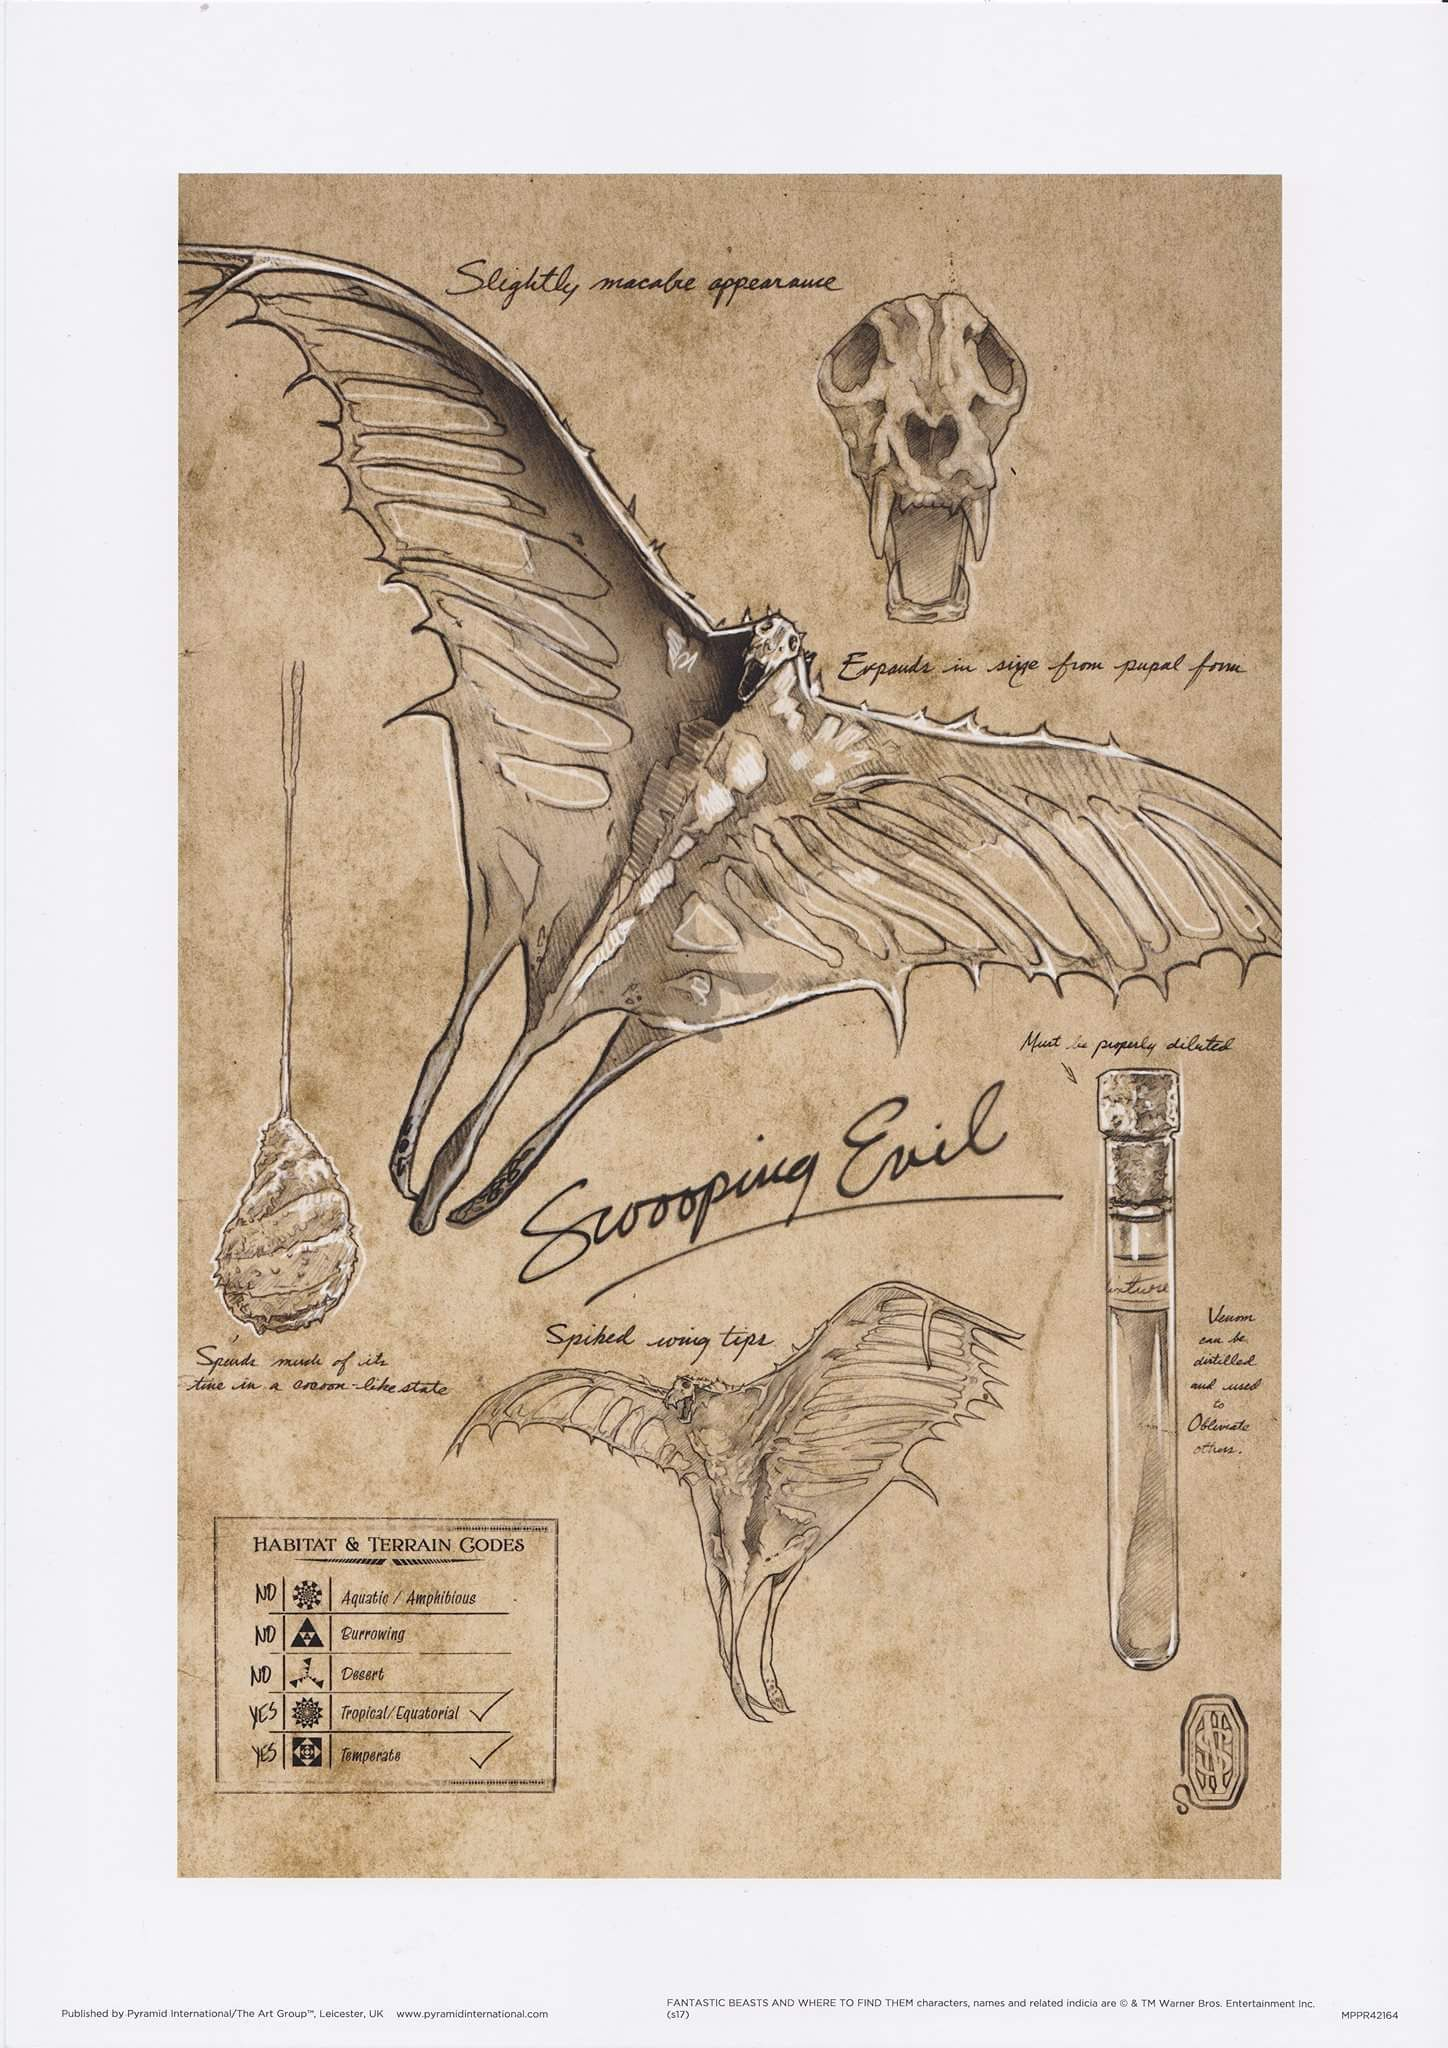 Mal Acechador Harry Potter Creatures Fantastic Beasts Creatures Fantastic Beasts